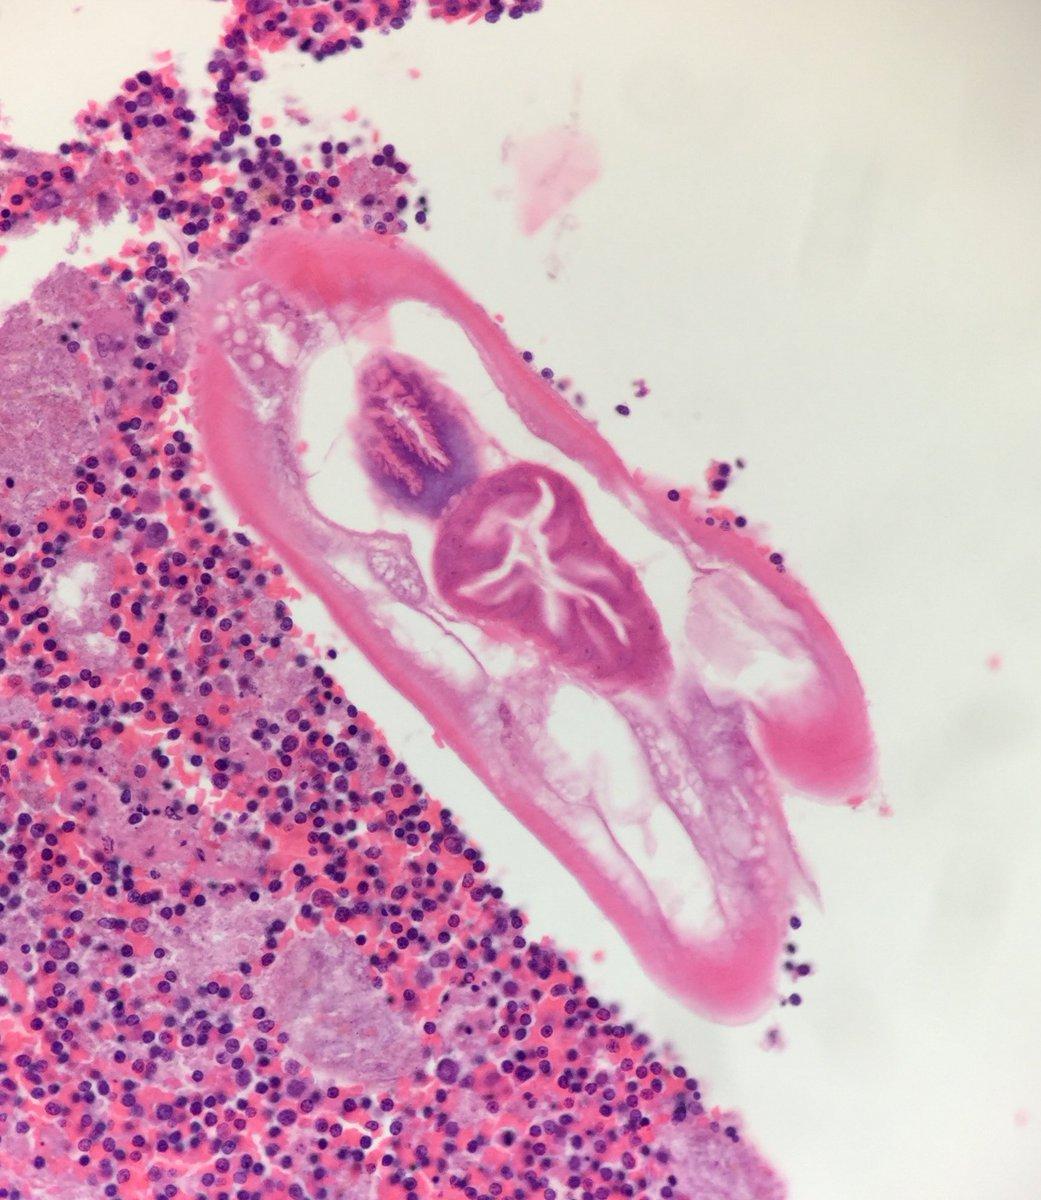 enterobius vermicularis histology)